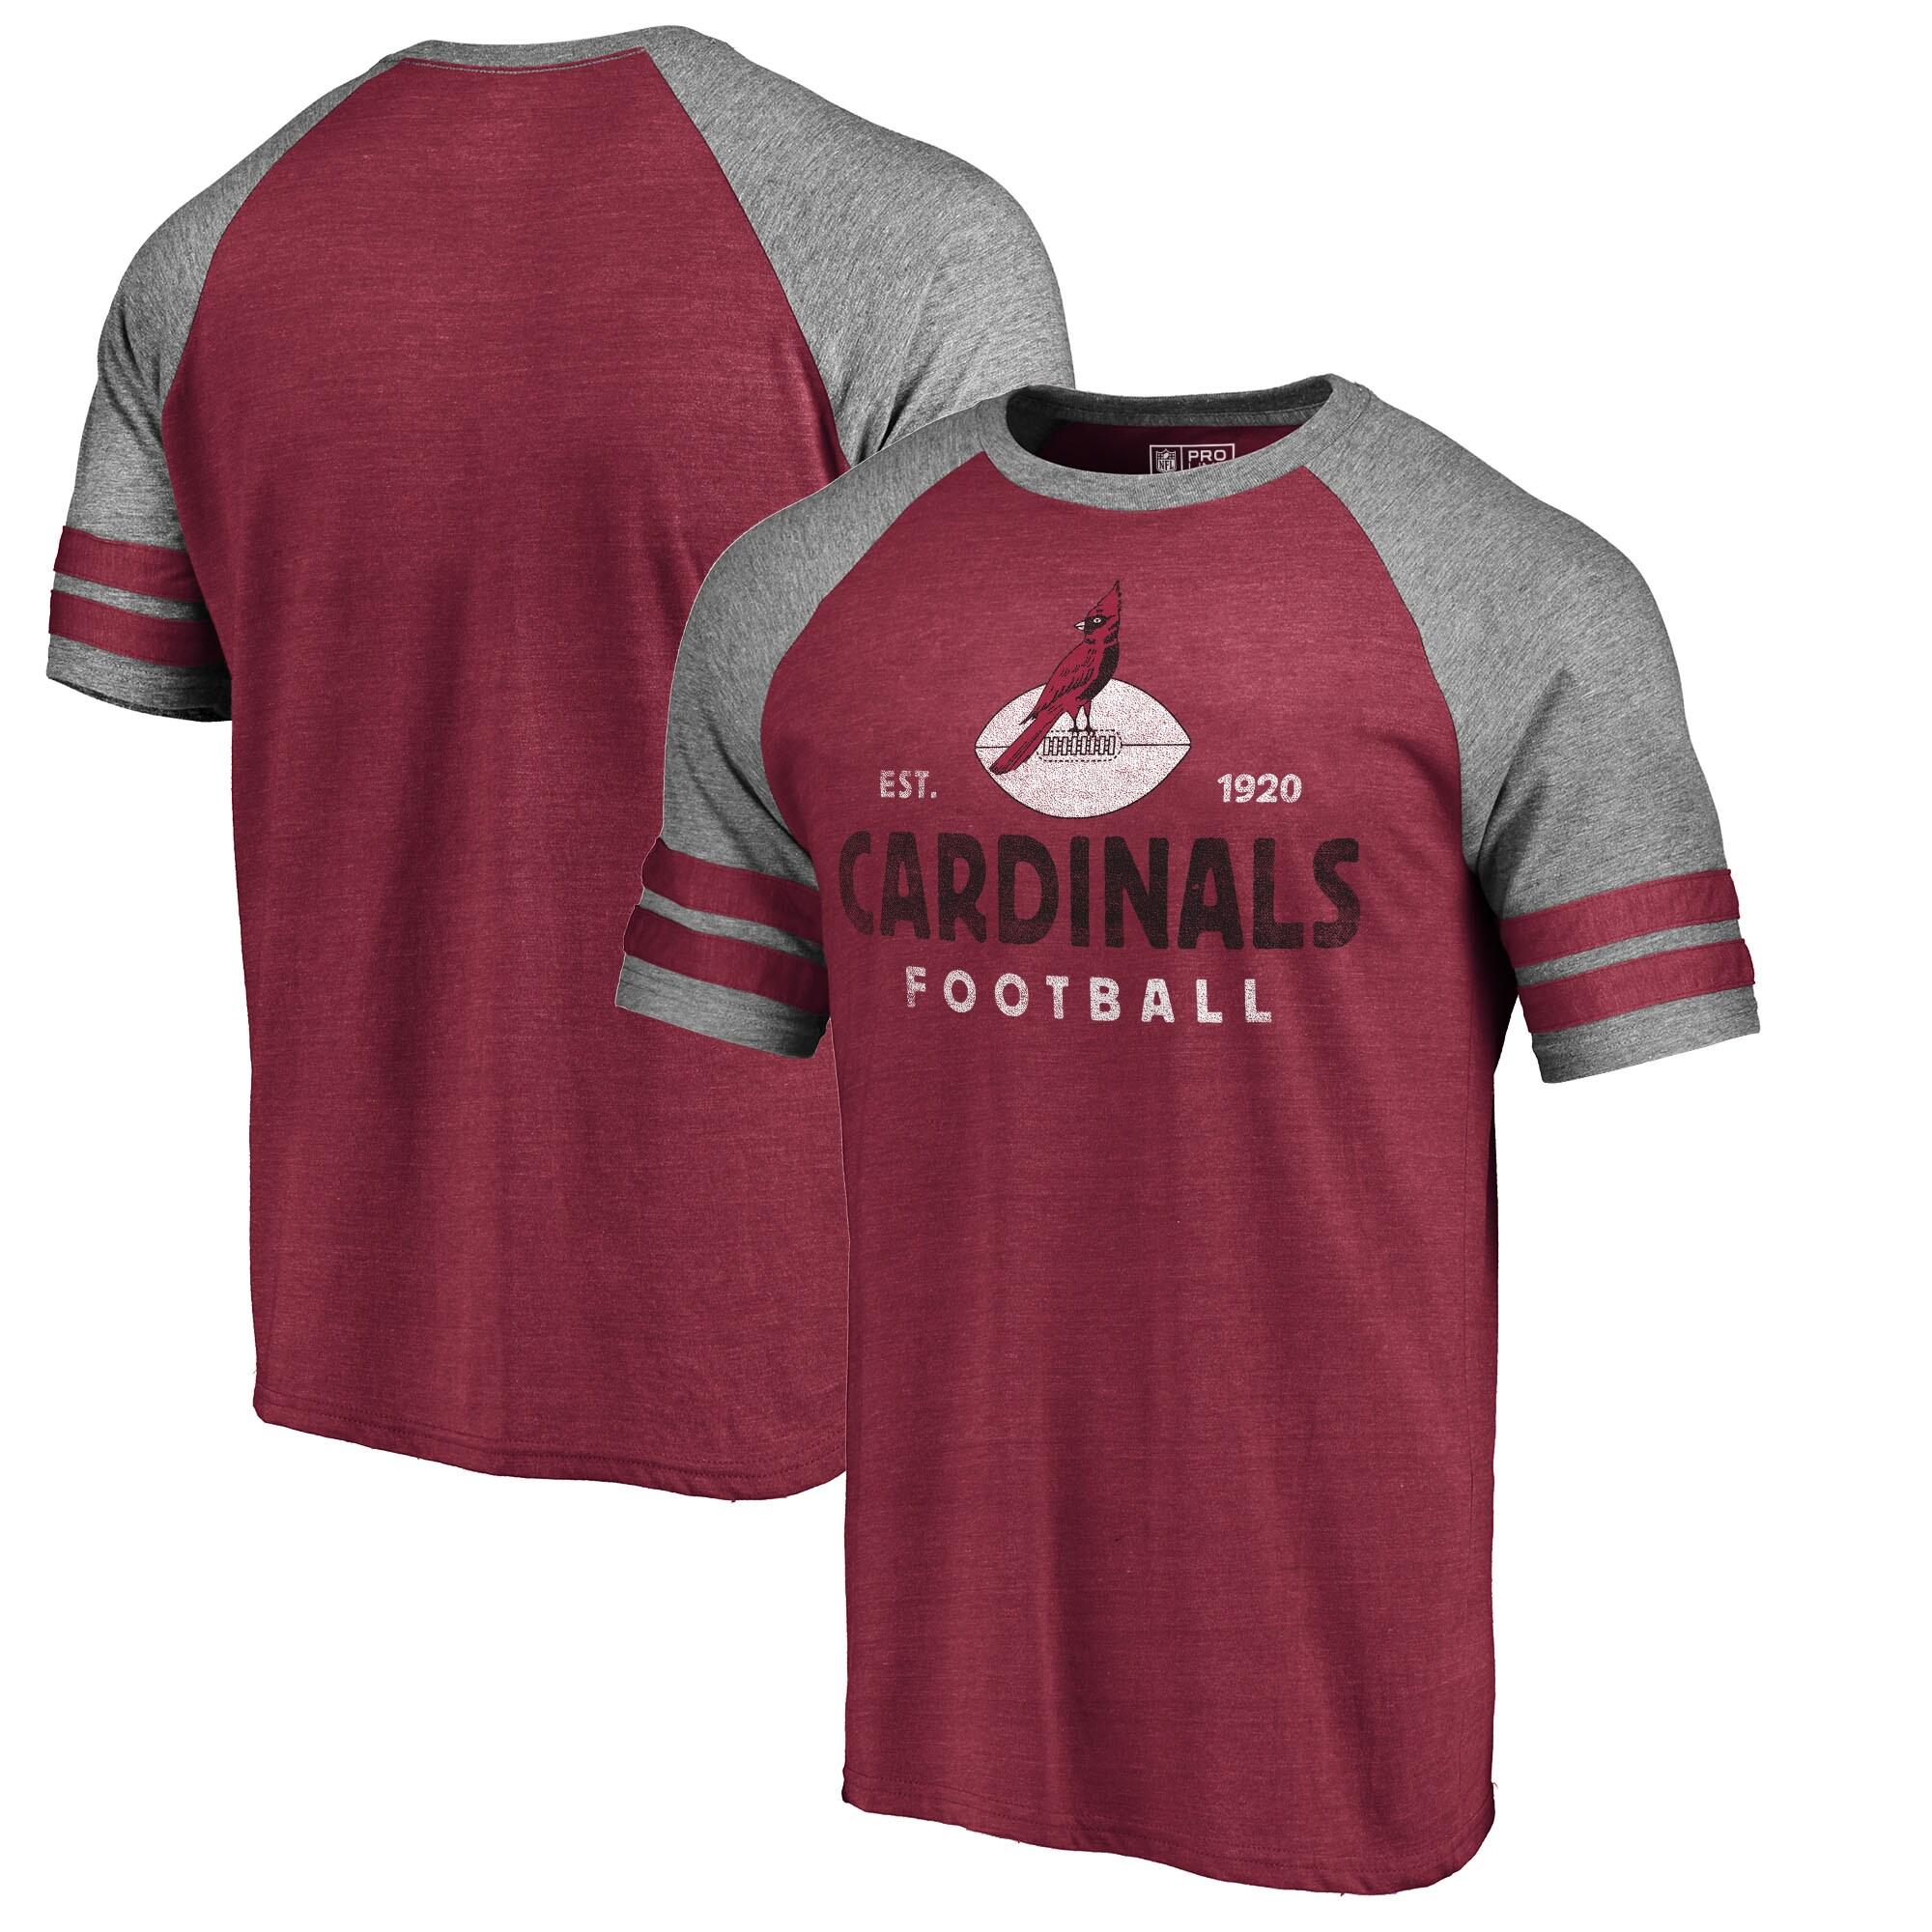 Arizona Cardinals NFL Pro Line by Fanatics Branded Timeless Collection Vintage Arch Tri-Blend Raglan T-Shirt - Cardinal